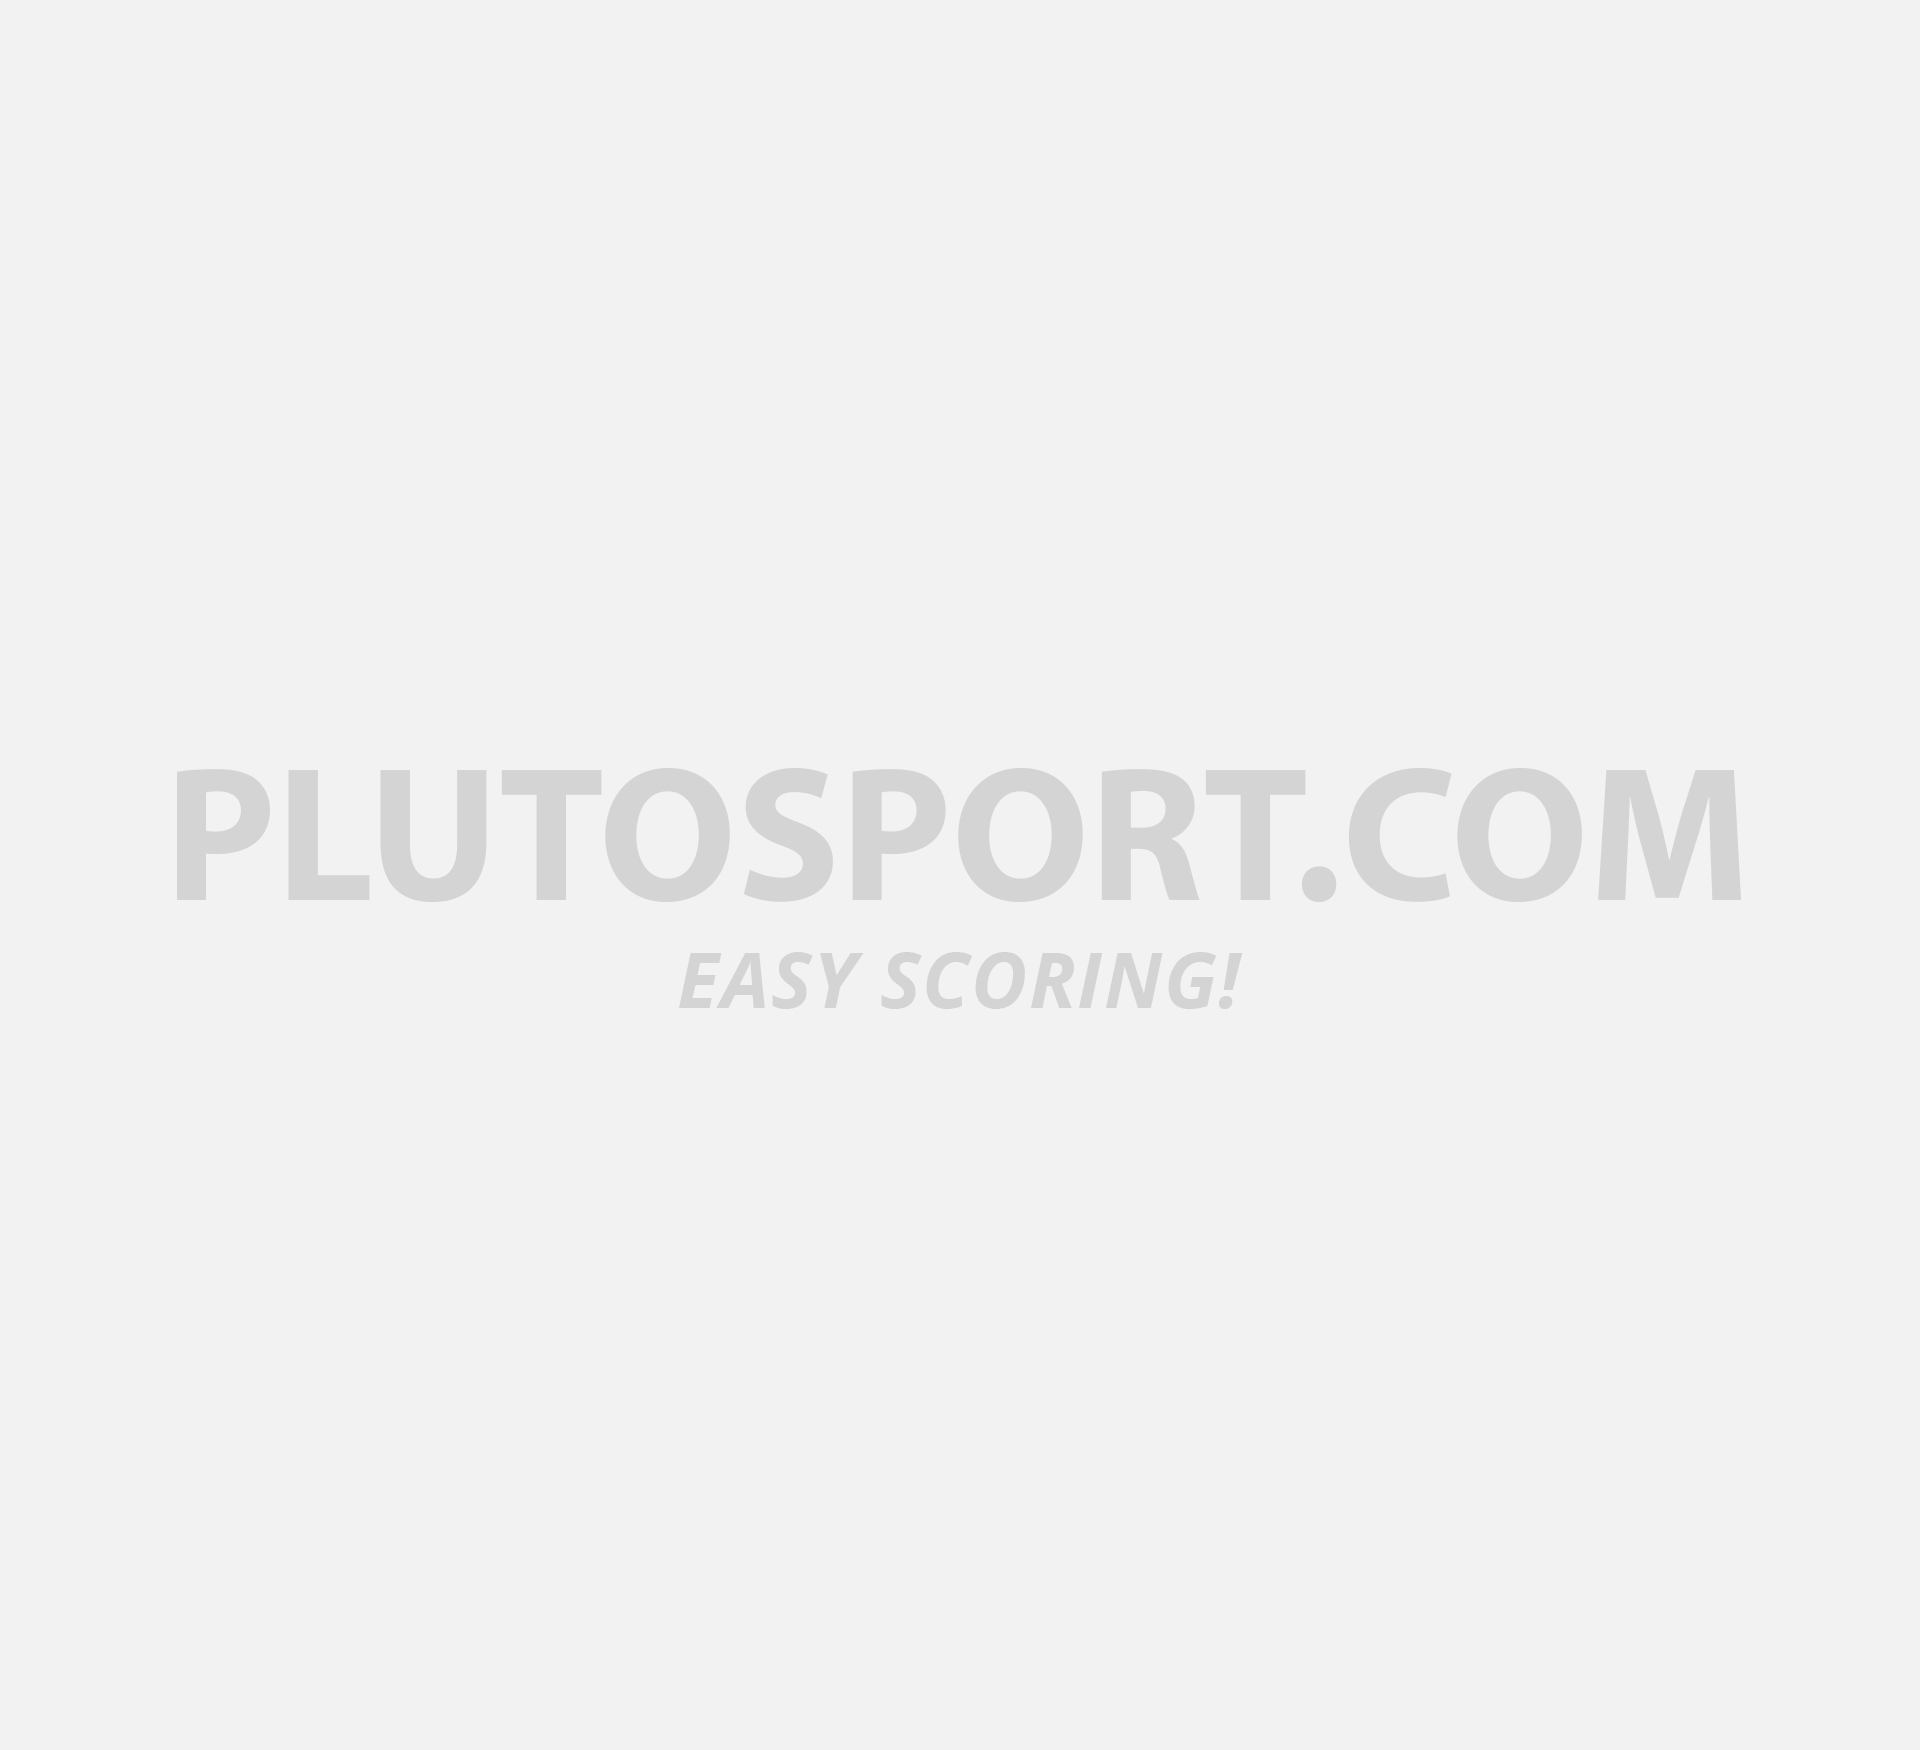 Nike Mercurial Superfly 360 Elite FG - Boots fixed stud - Shoes - Football  - Women  1899e41108